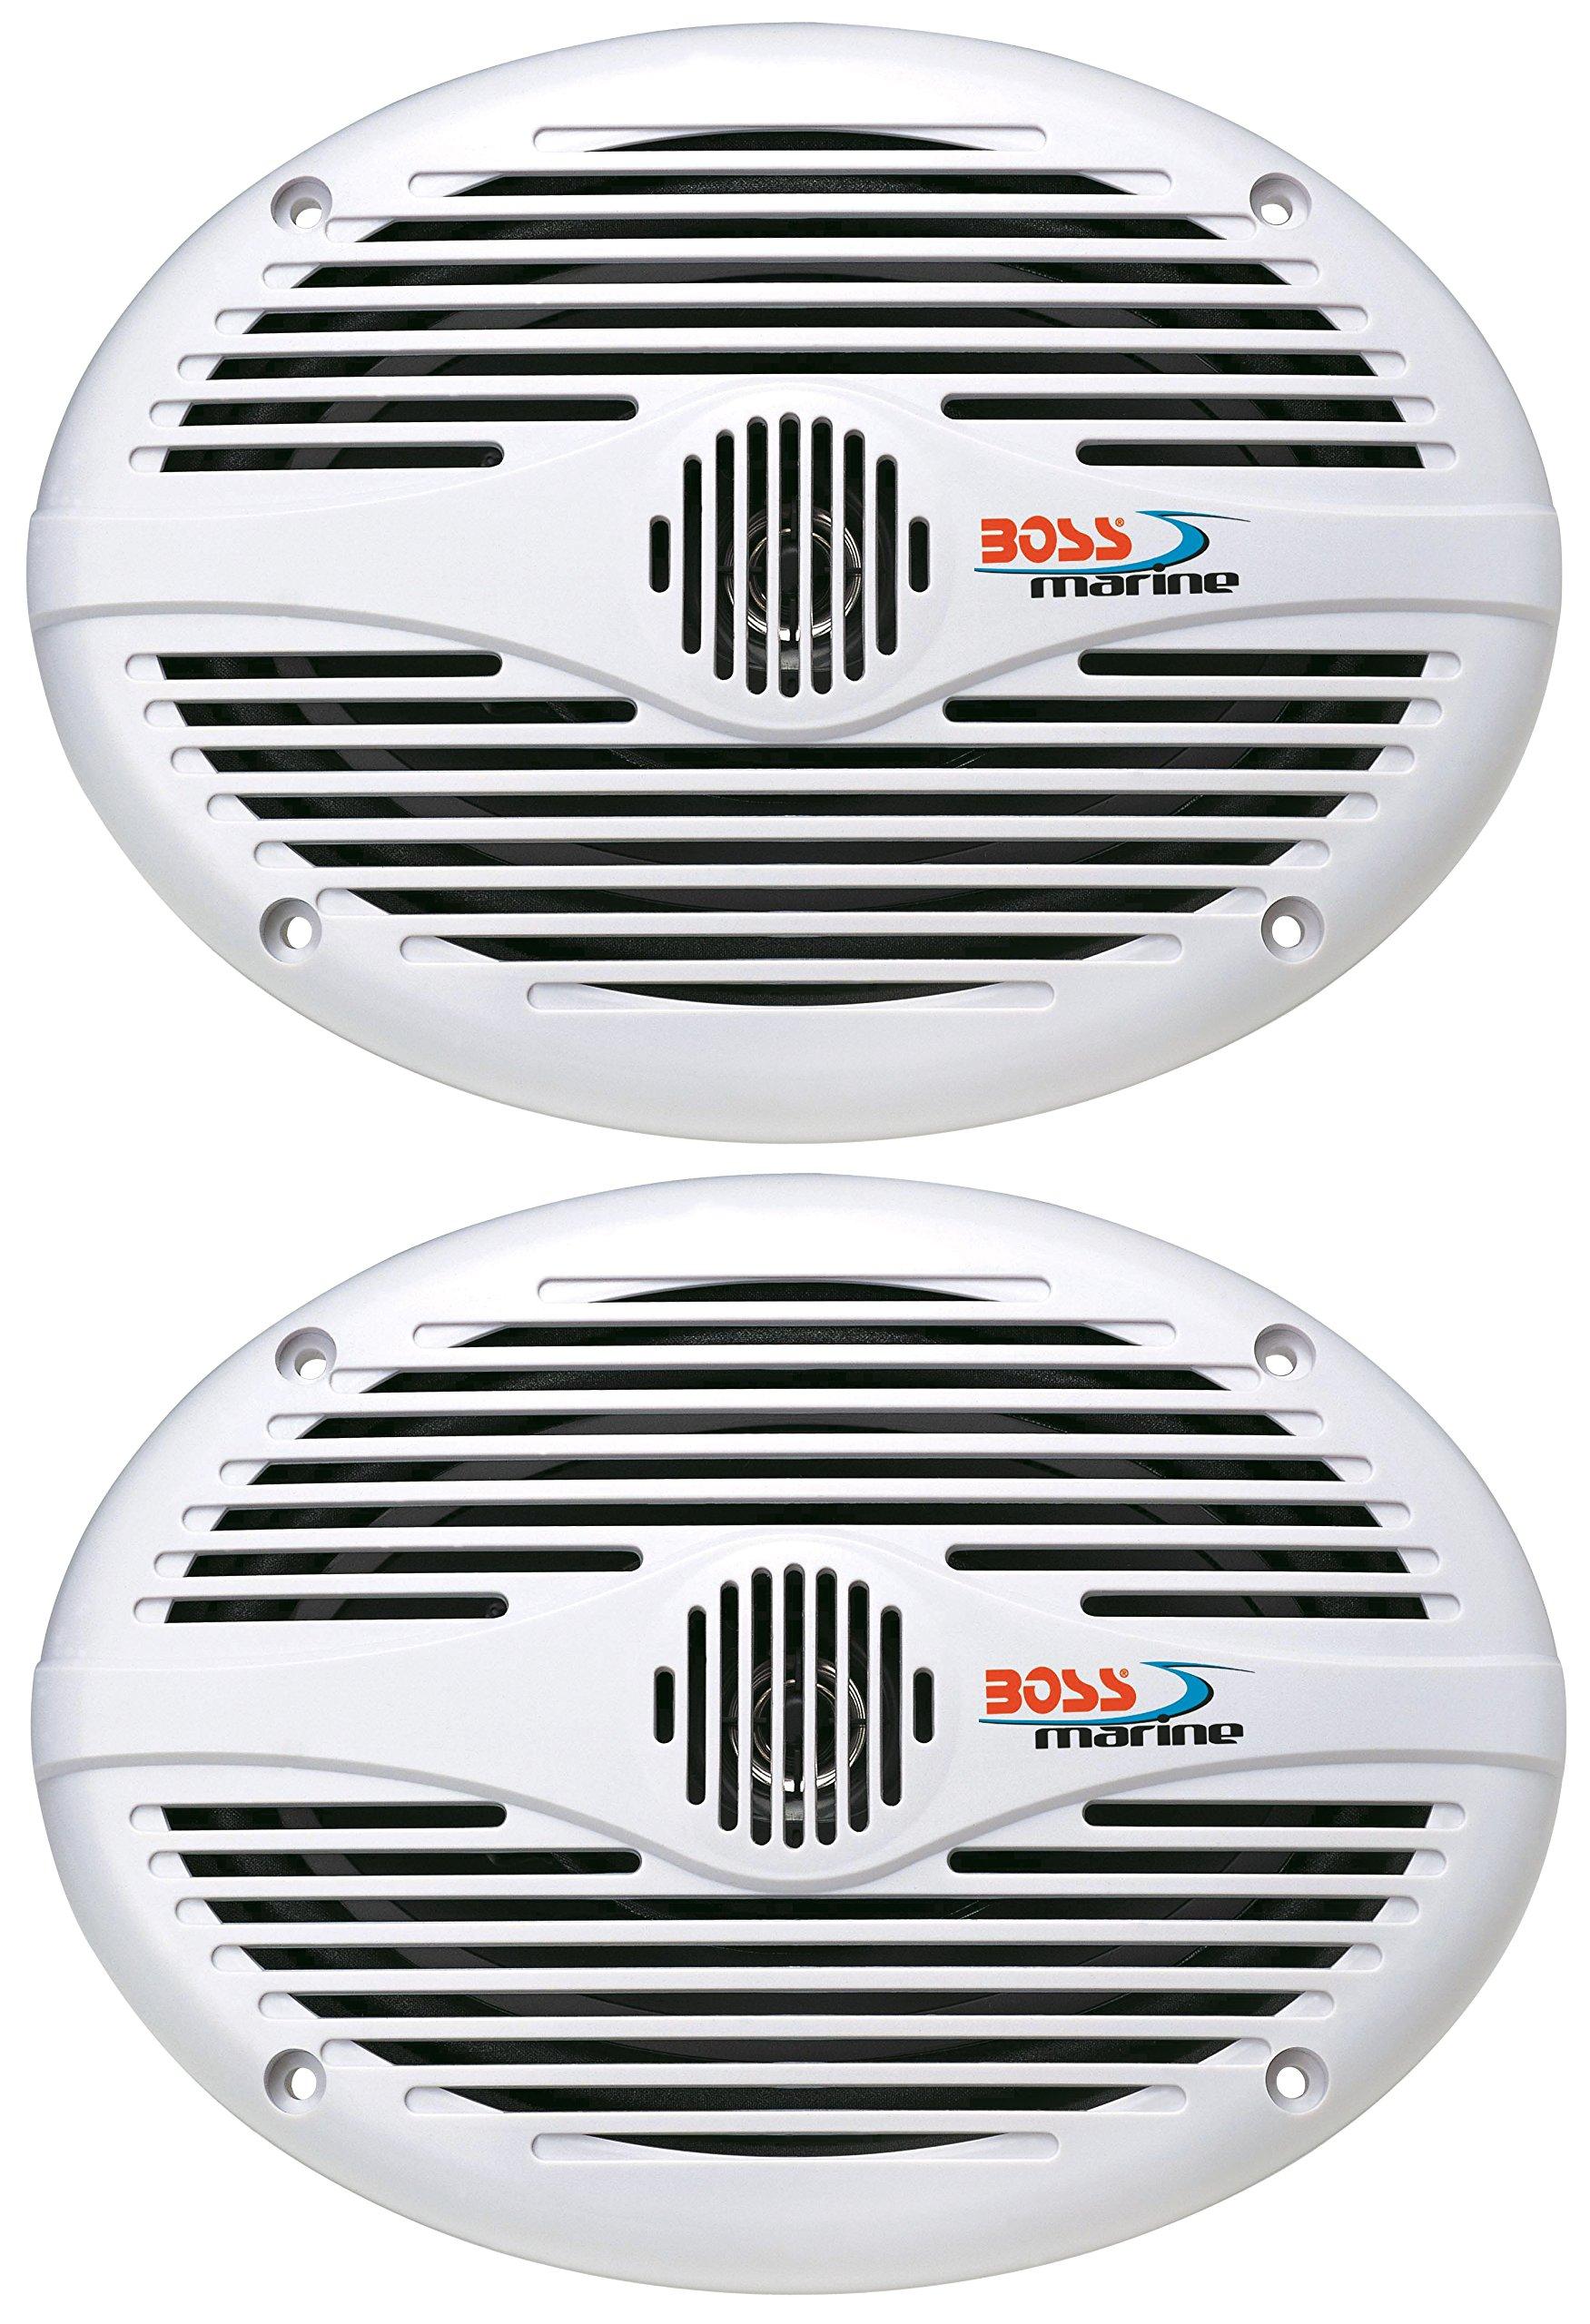 BOSS Audio Systems MR690 350 Watt Per Pair, 6 x 9 Inch, Full Range, 2 Way Weatherproof Marine Speakers Sold in Pairs by BOSS Audio Systems